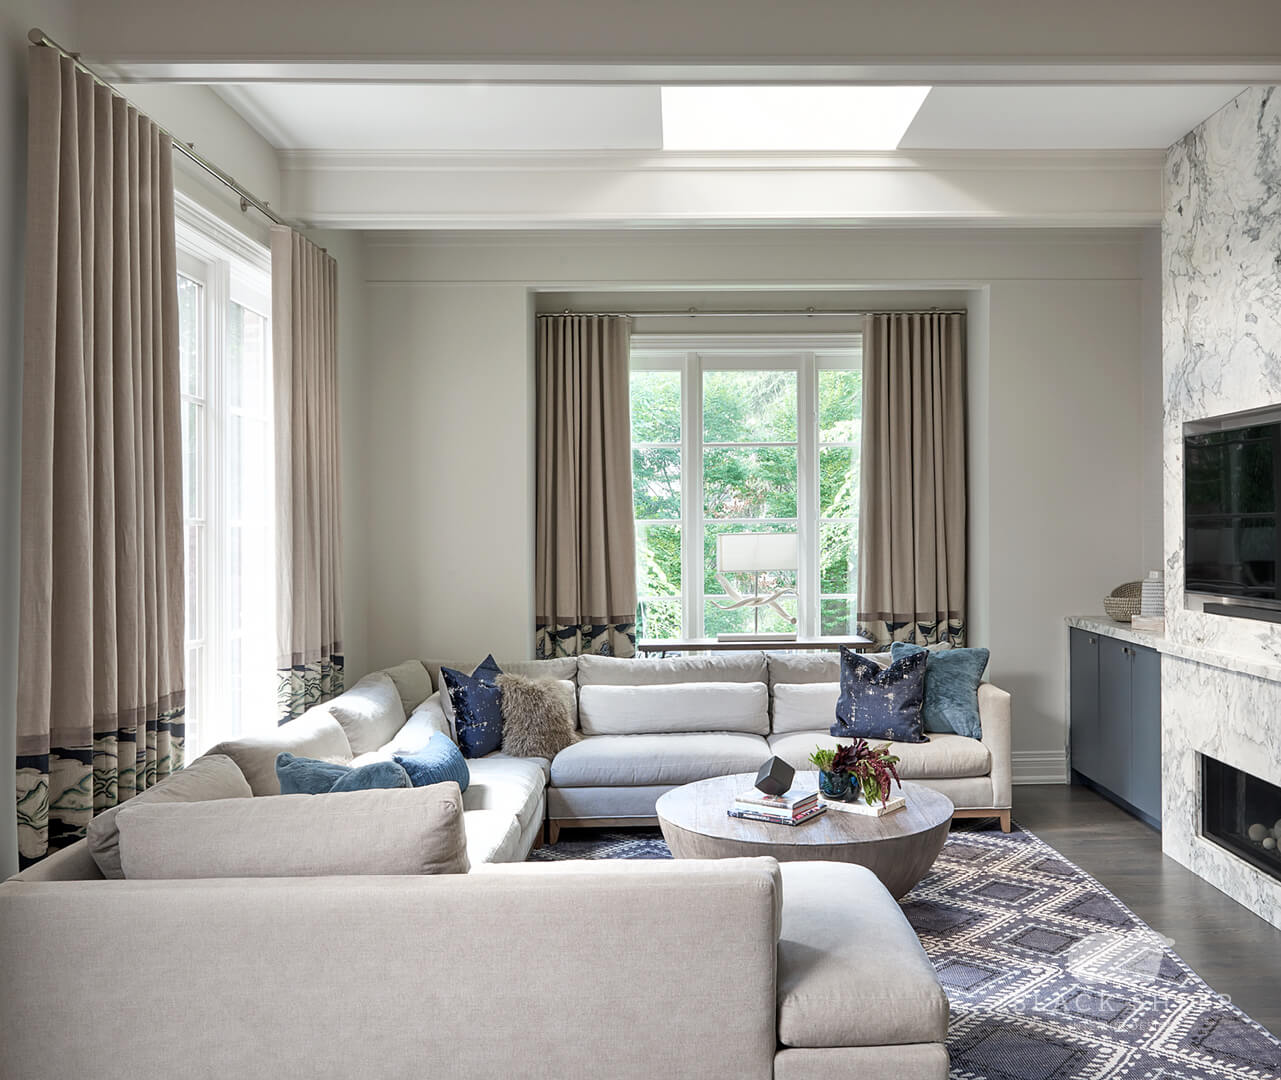 Black Sheep Interior Design - St Leonard 17